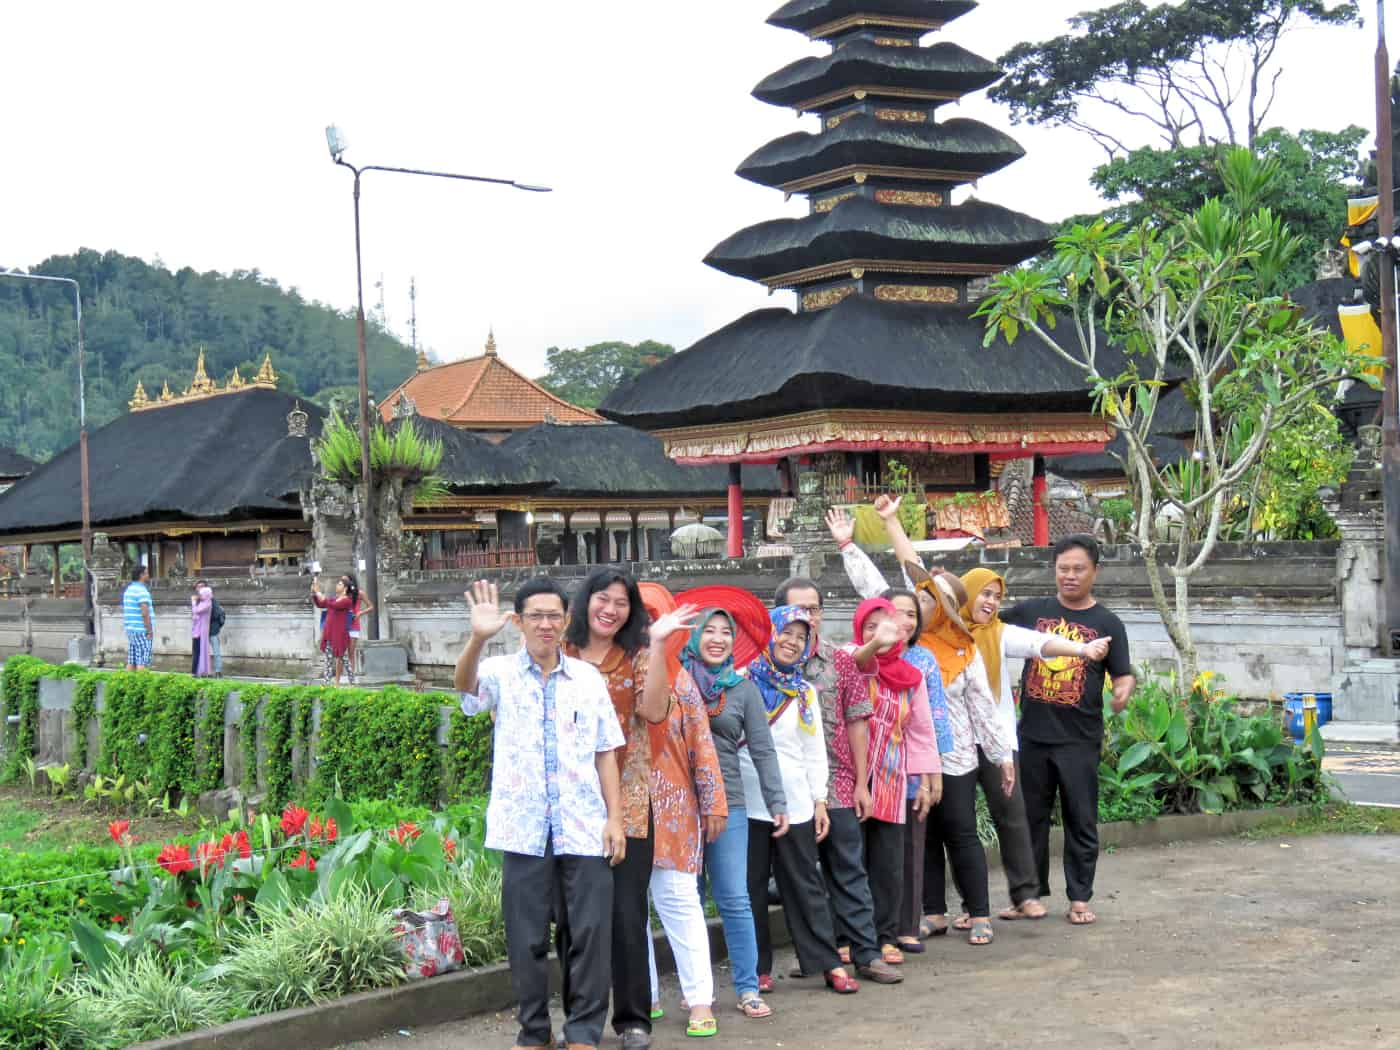 gogirlrun_bali_indonesien_privatetour_norden_Pura Ulun Danu Bratan_86